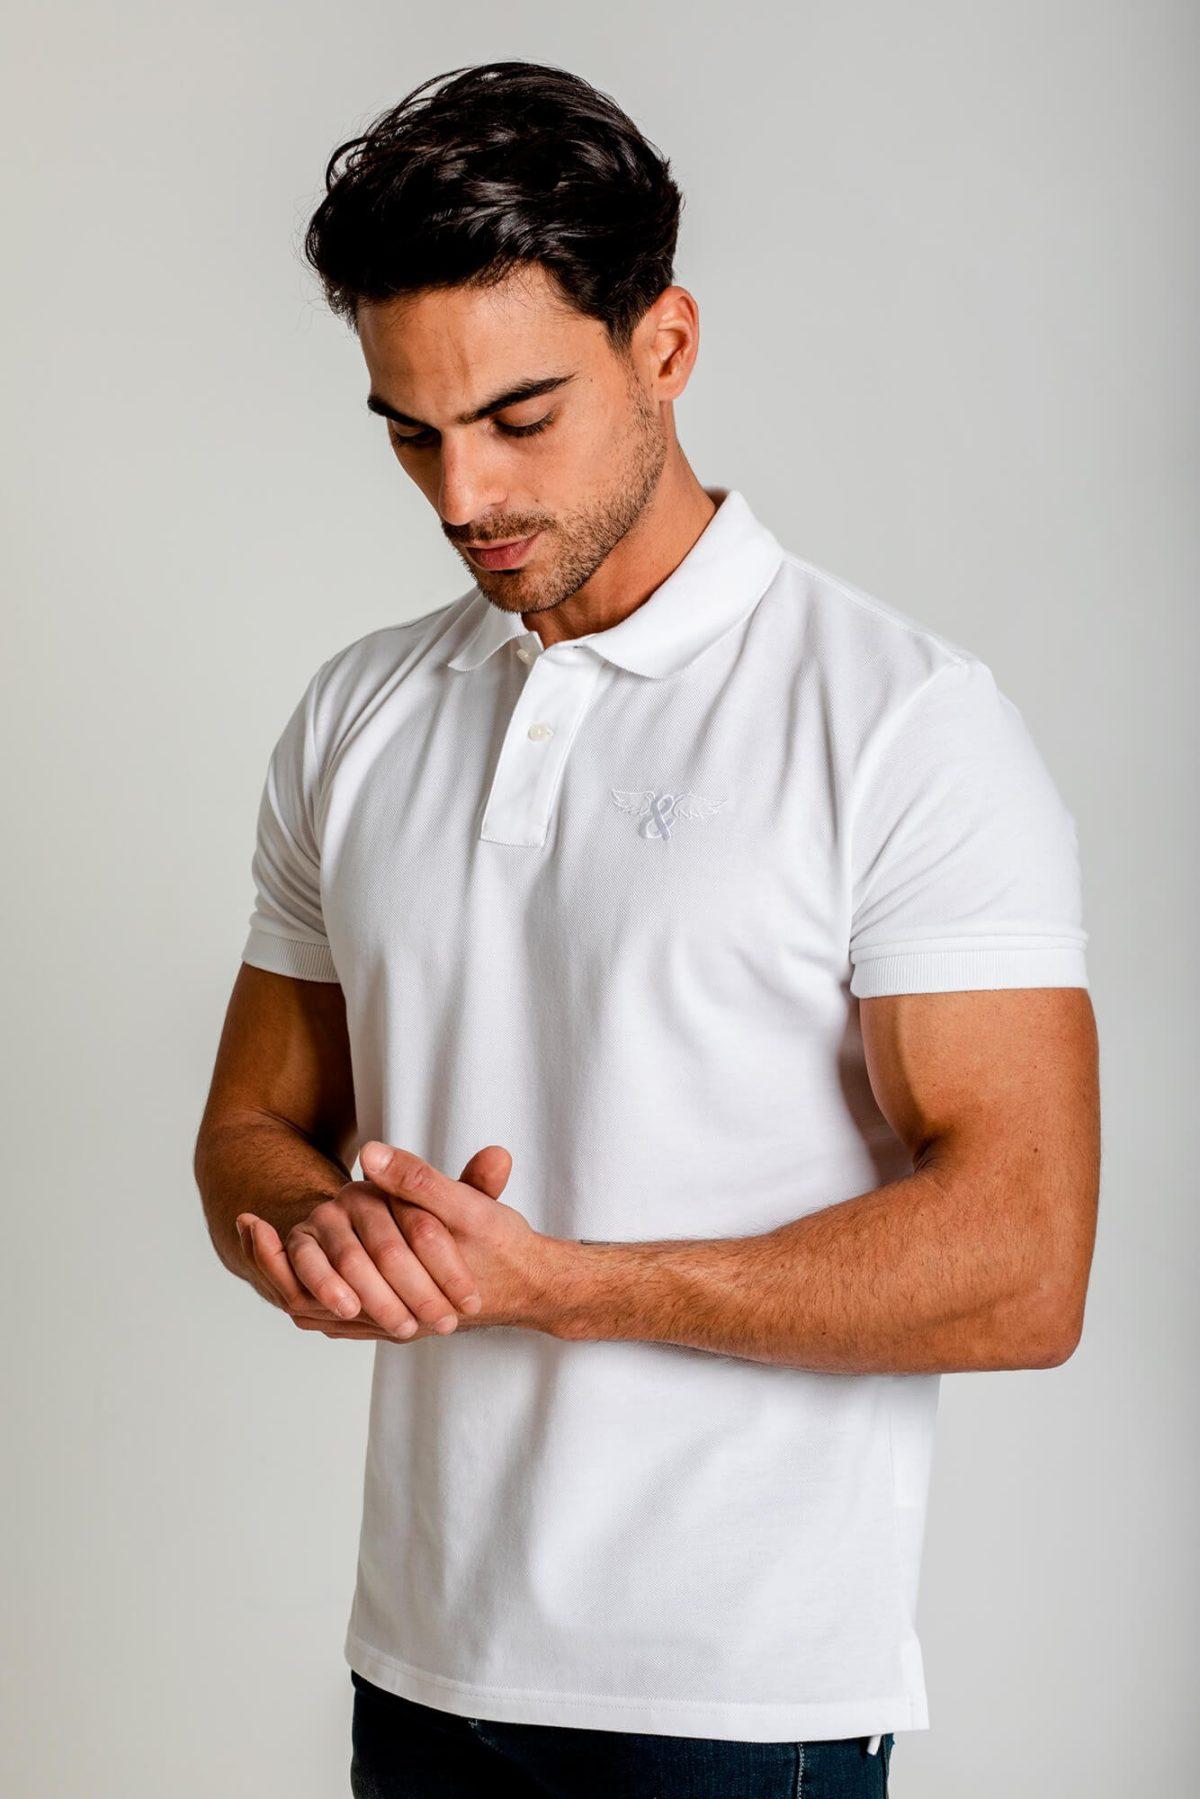 Camiseta polo classic slim fit. 100% Algodón. Estilo urbano ELIU streetwear.